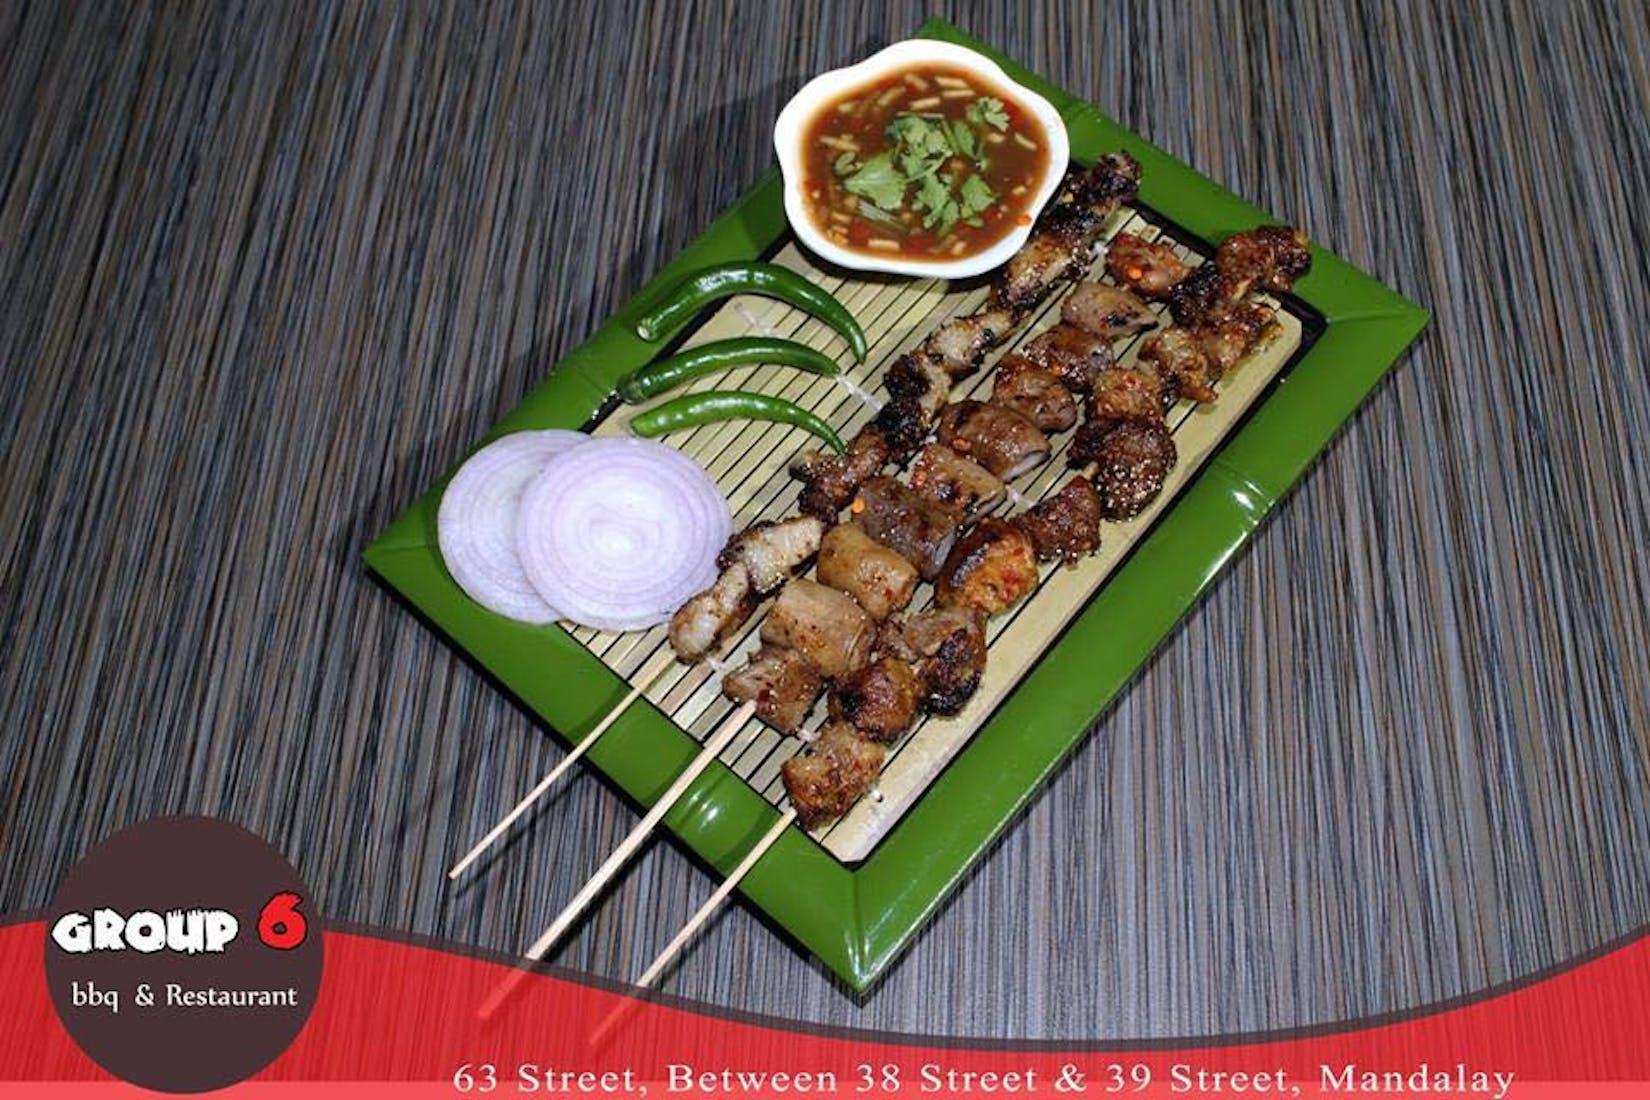 Group 6 bbq & Restaurant | yathar